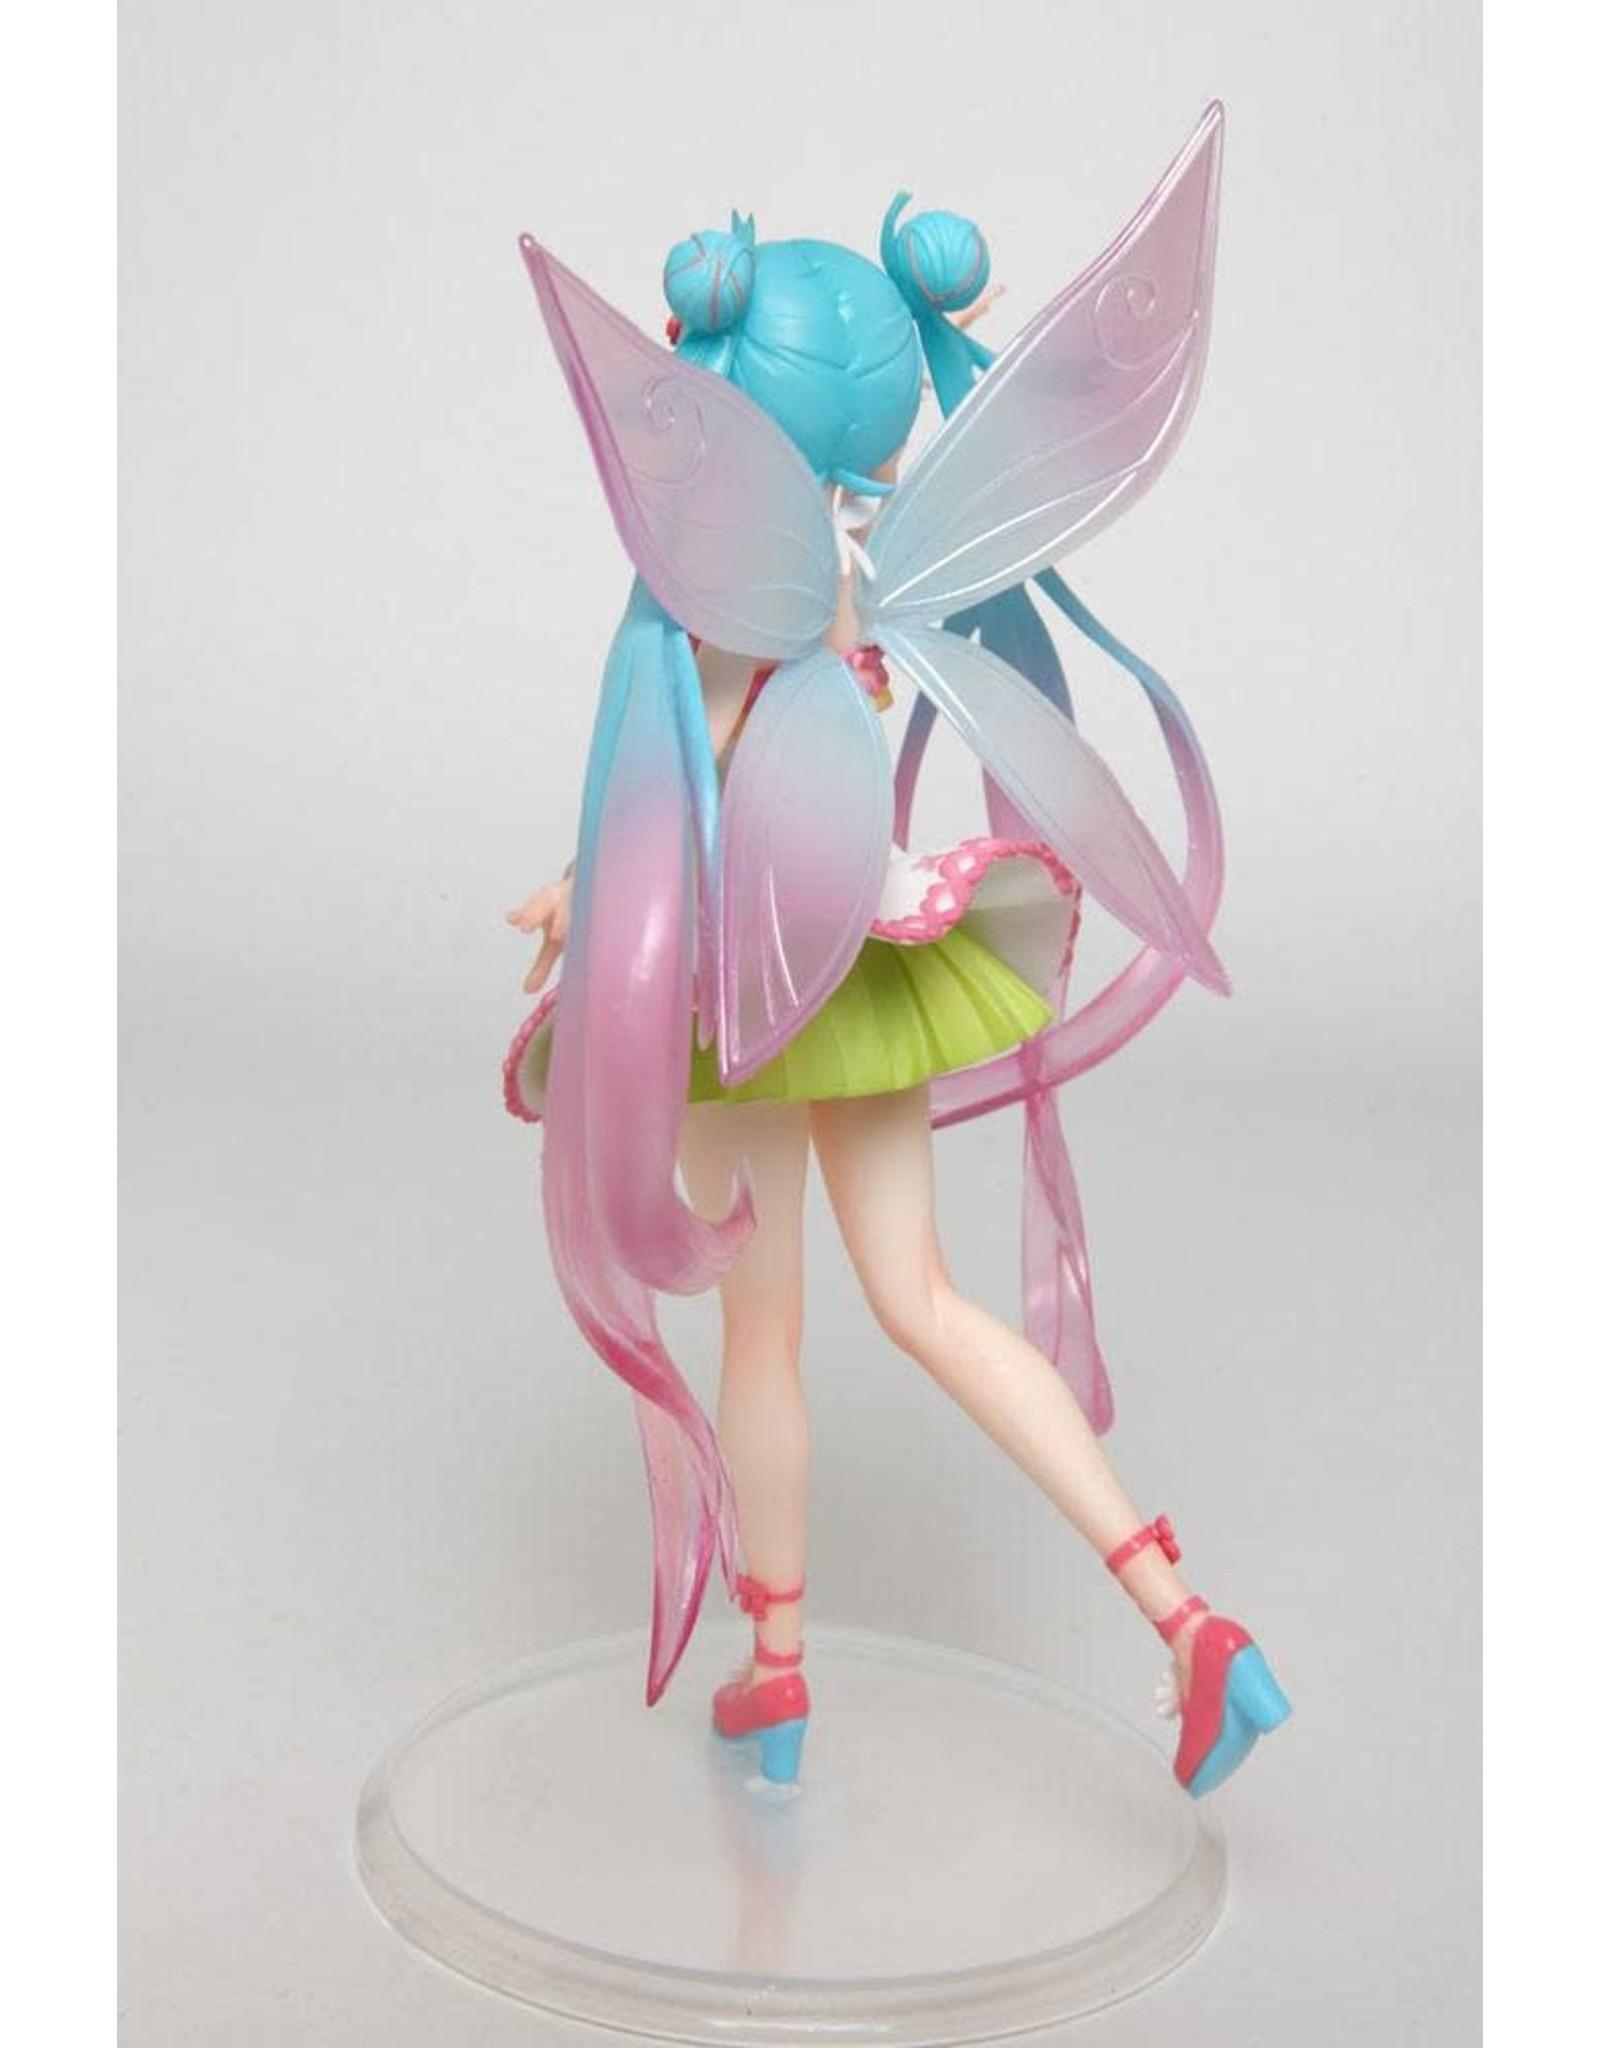 Hatsune Miku - PVC Figure - 3rd Season Spring Version - 18 cm